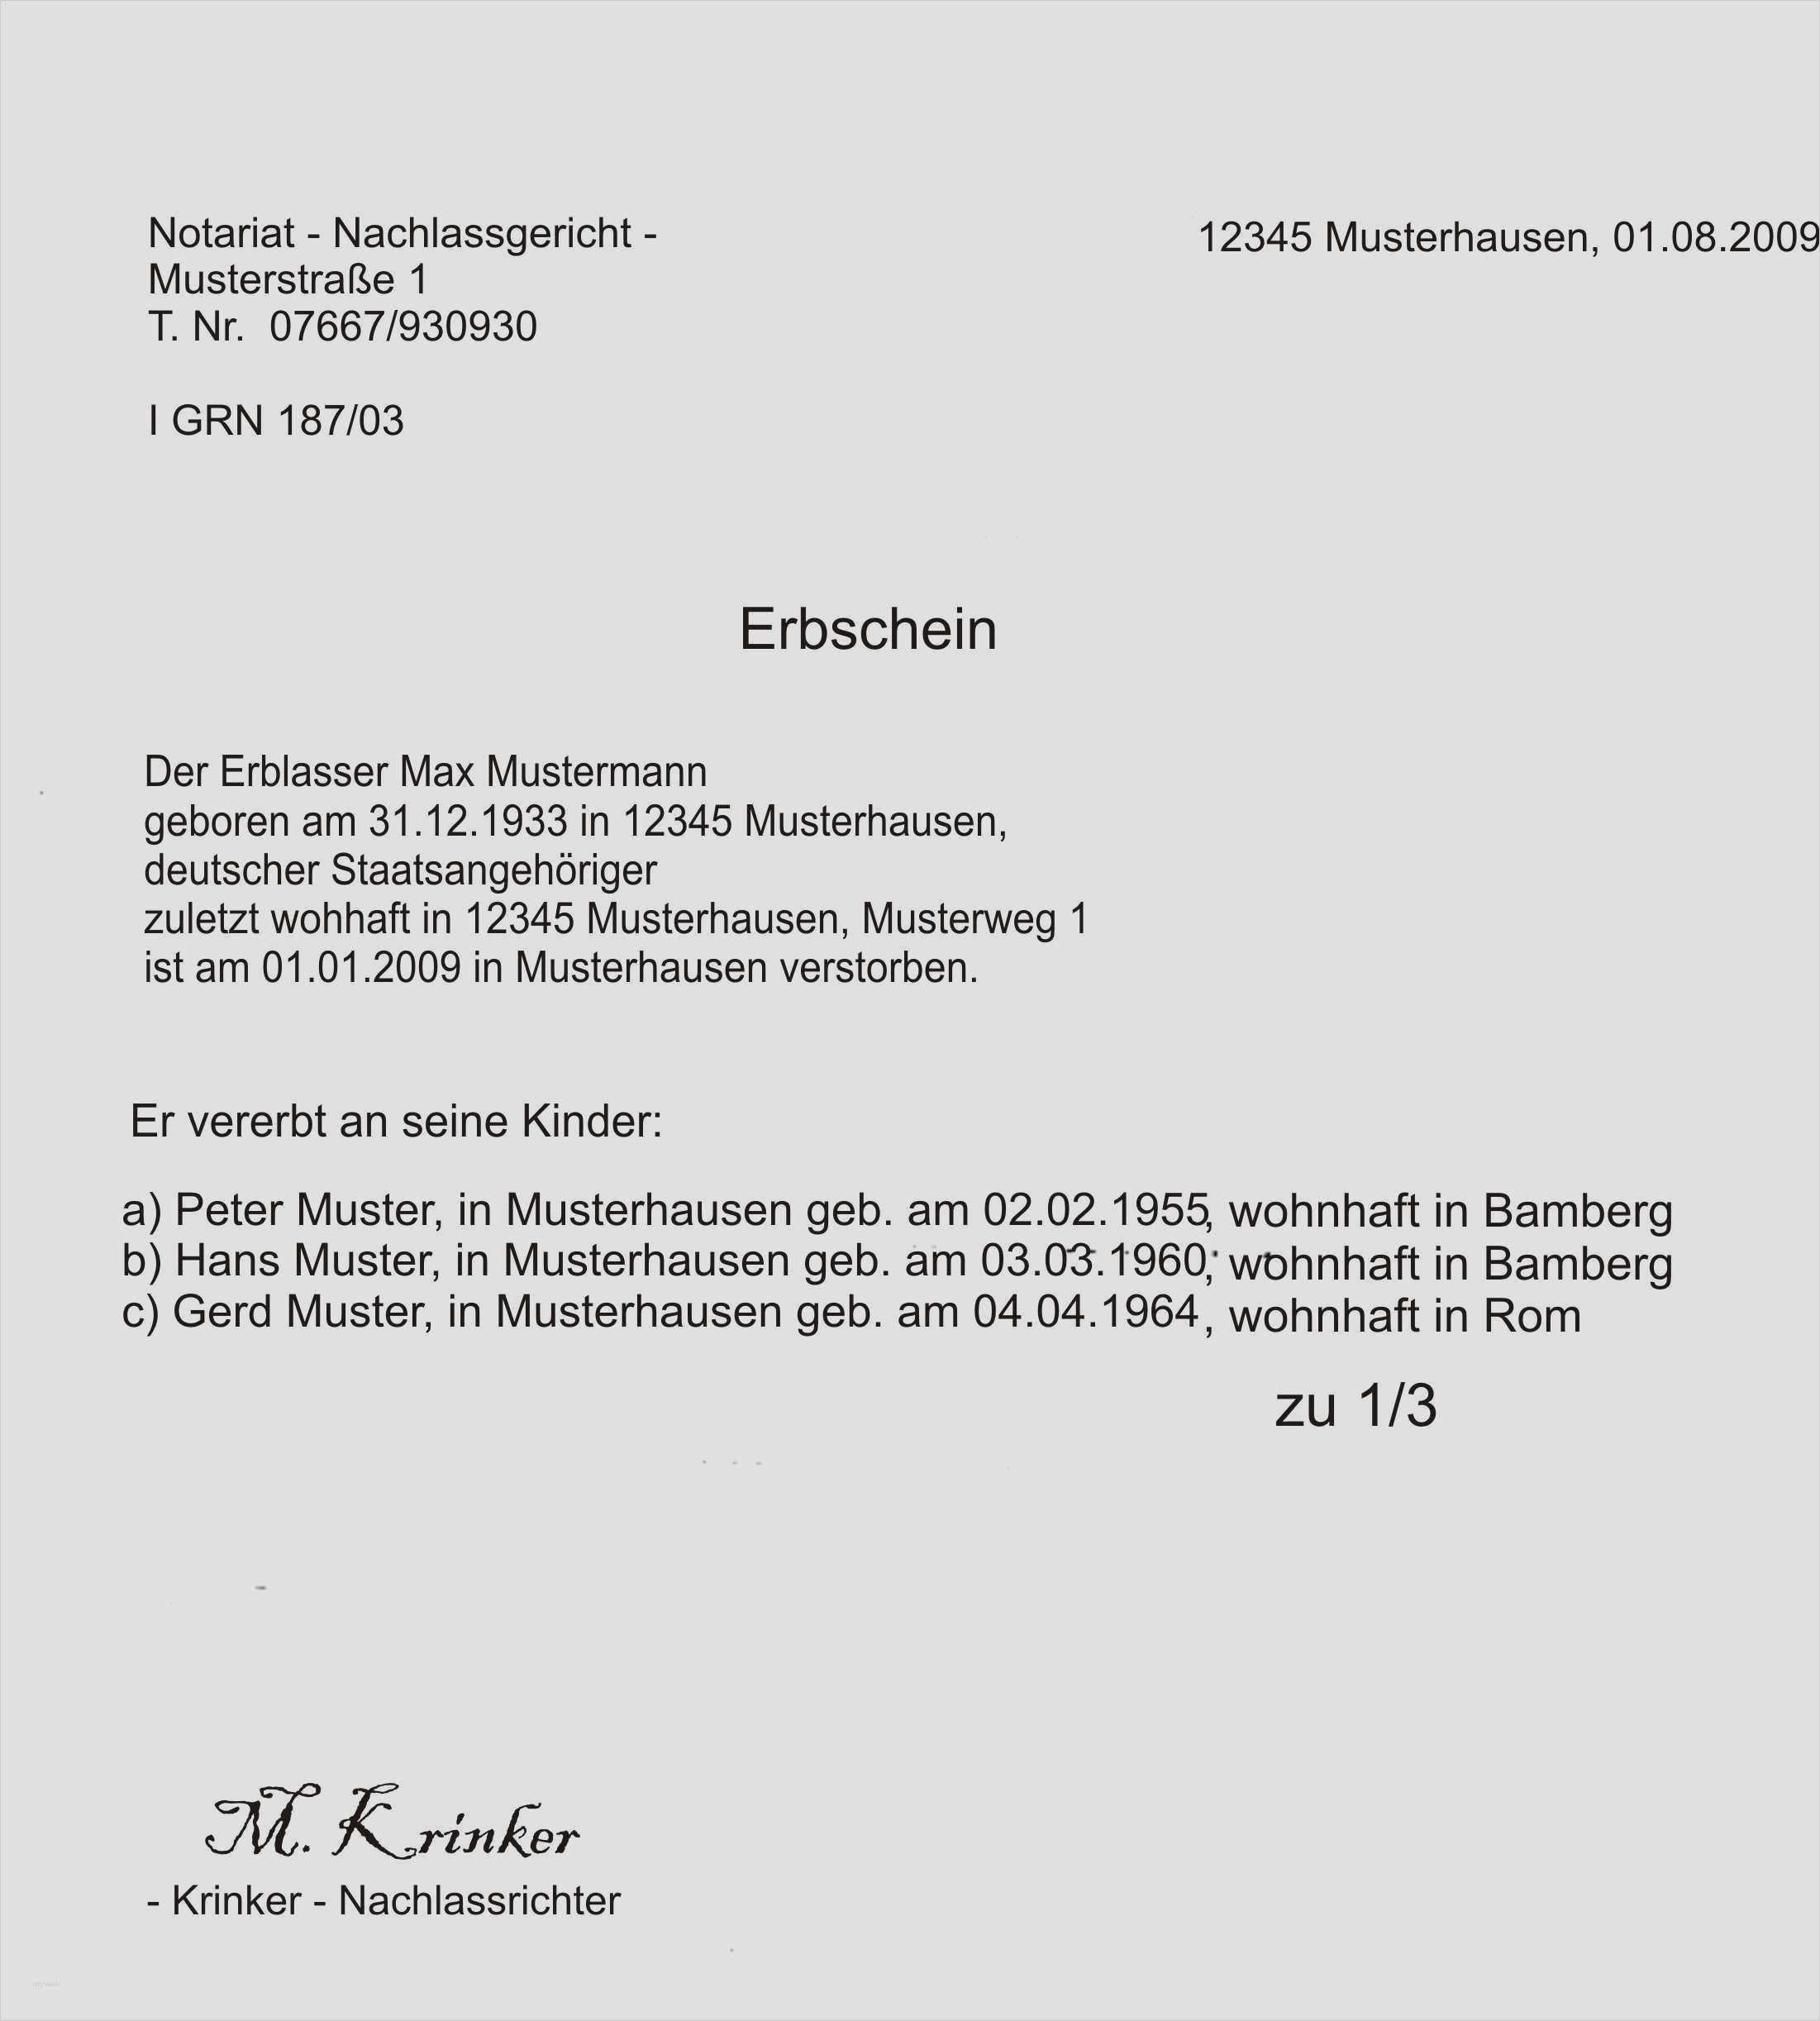 Kündigung Telefonanschluss todesfall Vorlage Angenehm 46 Kundigung Handyvertrag todesfall Muster